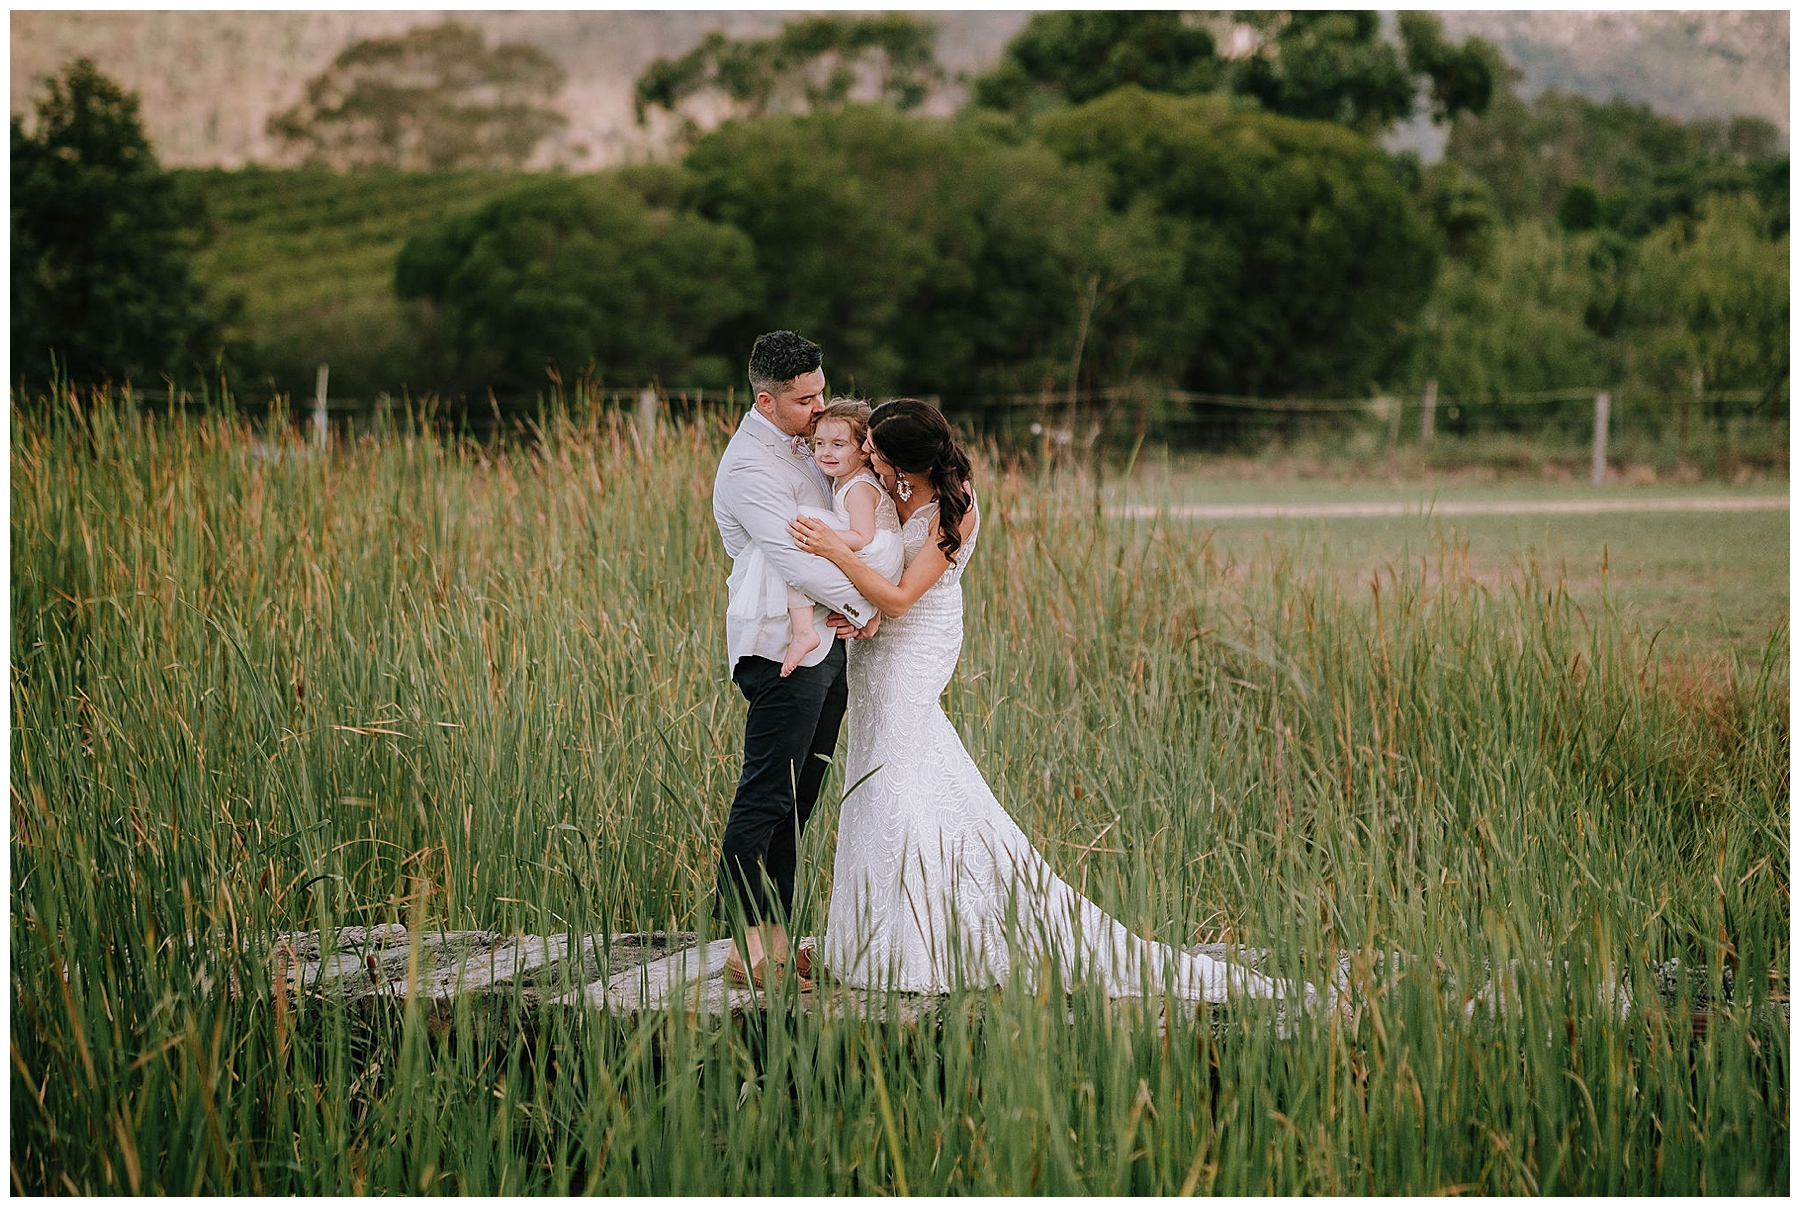 Adam's Peak Wedding Photos + Popcorn Photography_0059.jpg